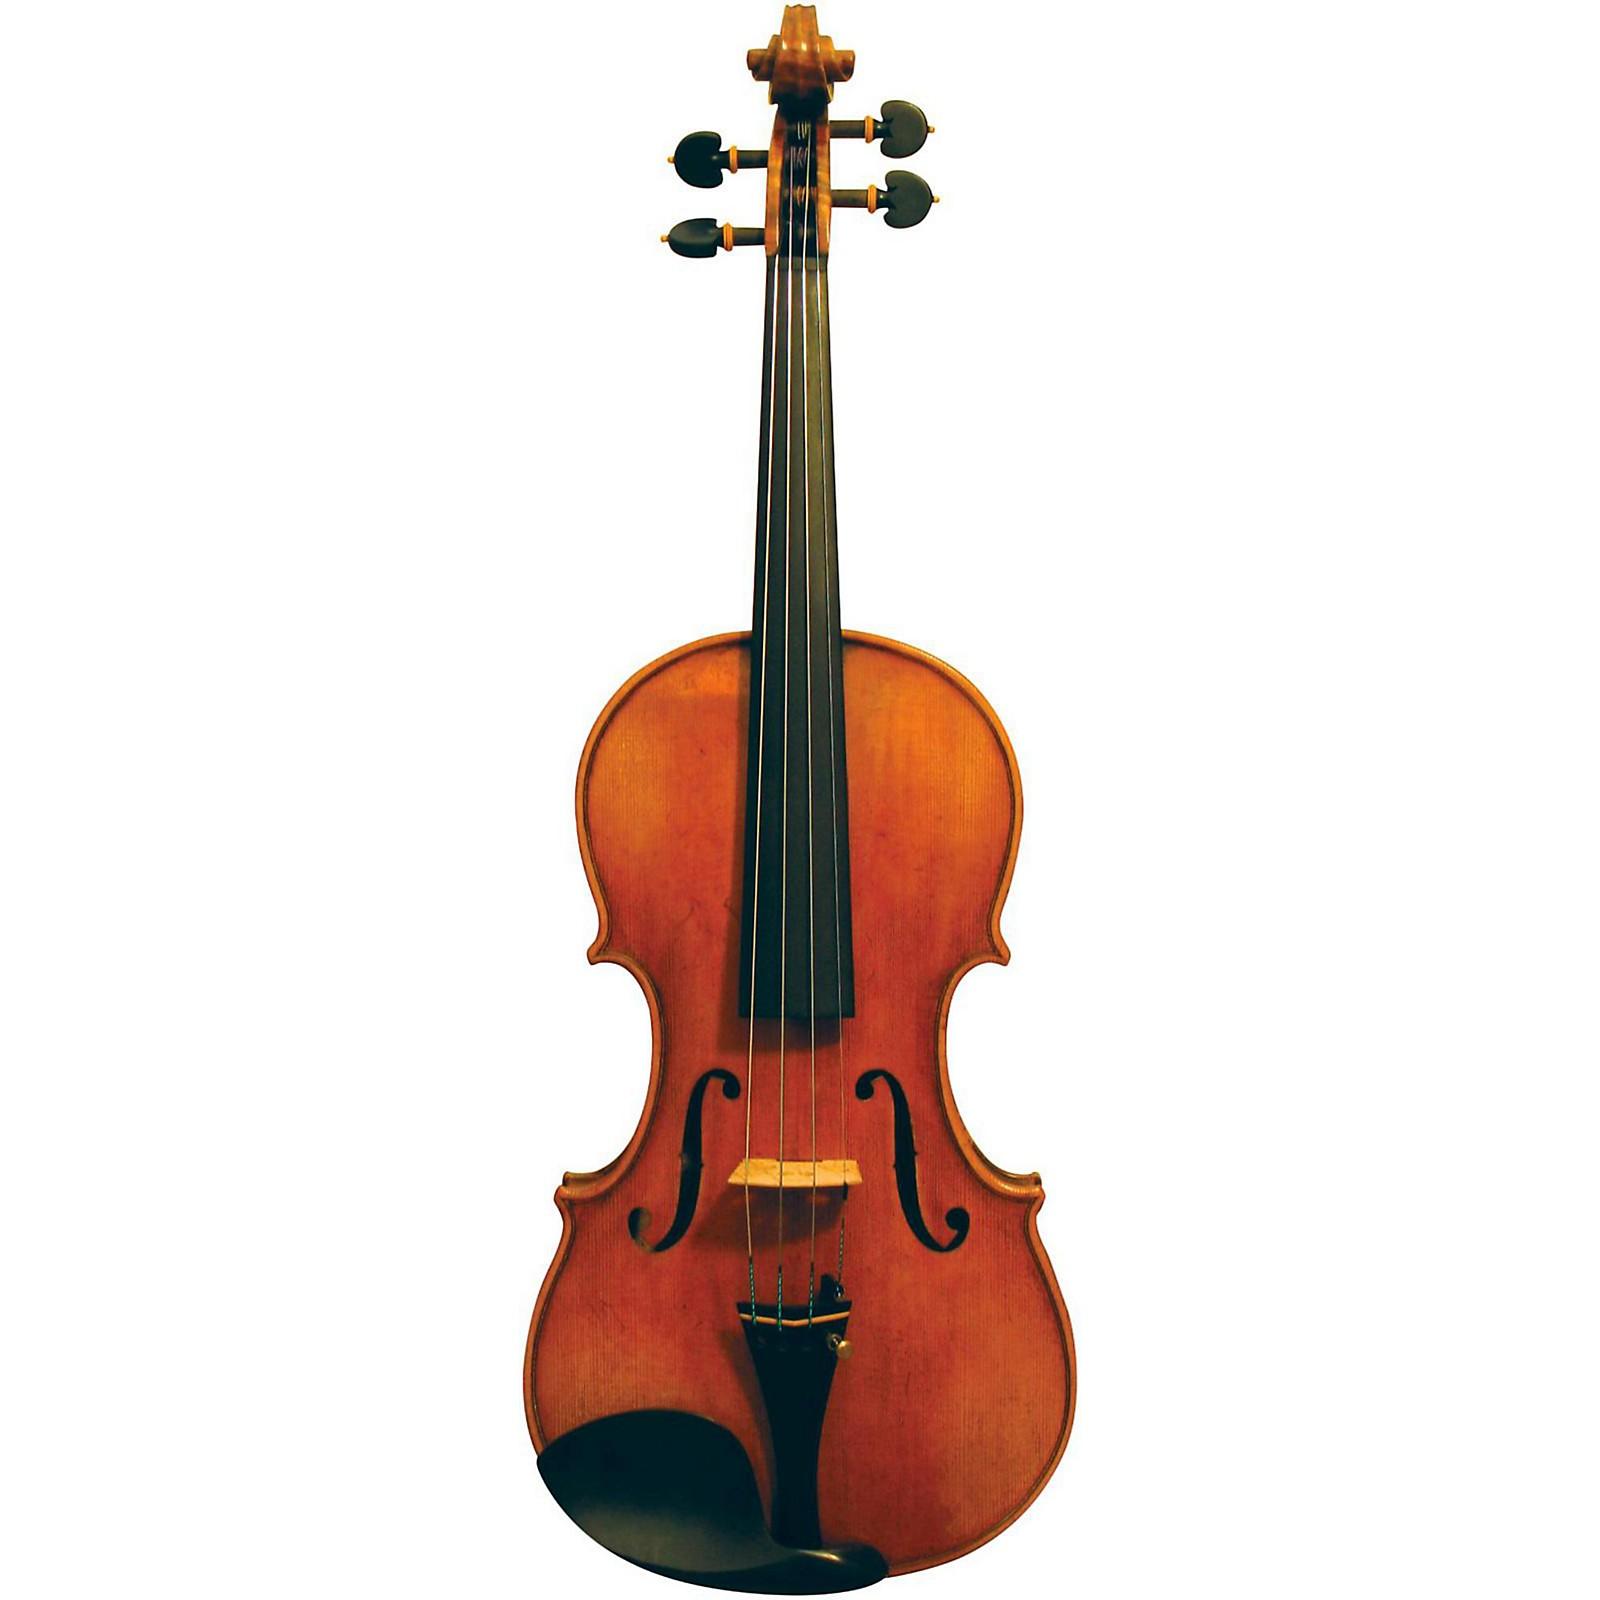 Maple Leaf Strings Burled Maple Craftsman Collection Violin